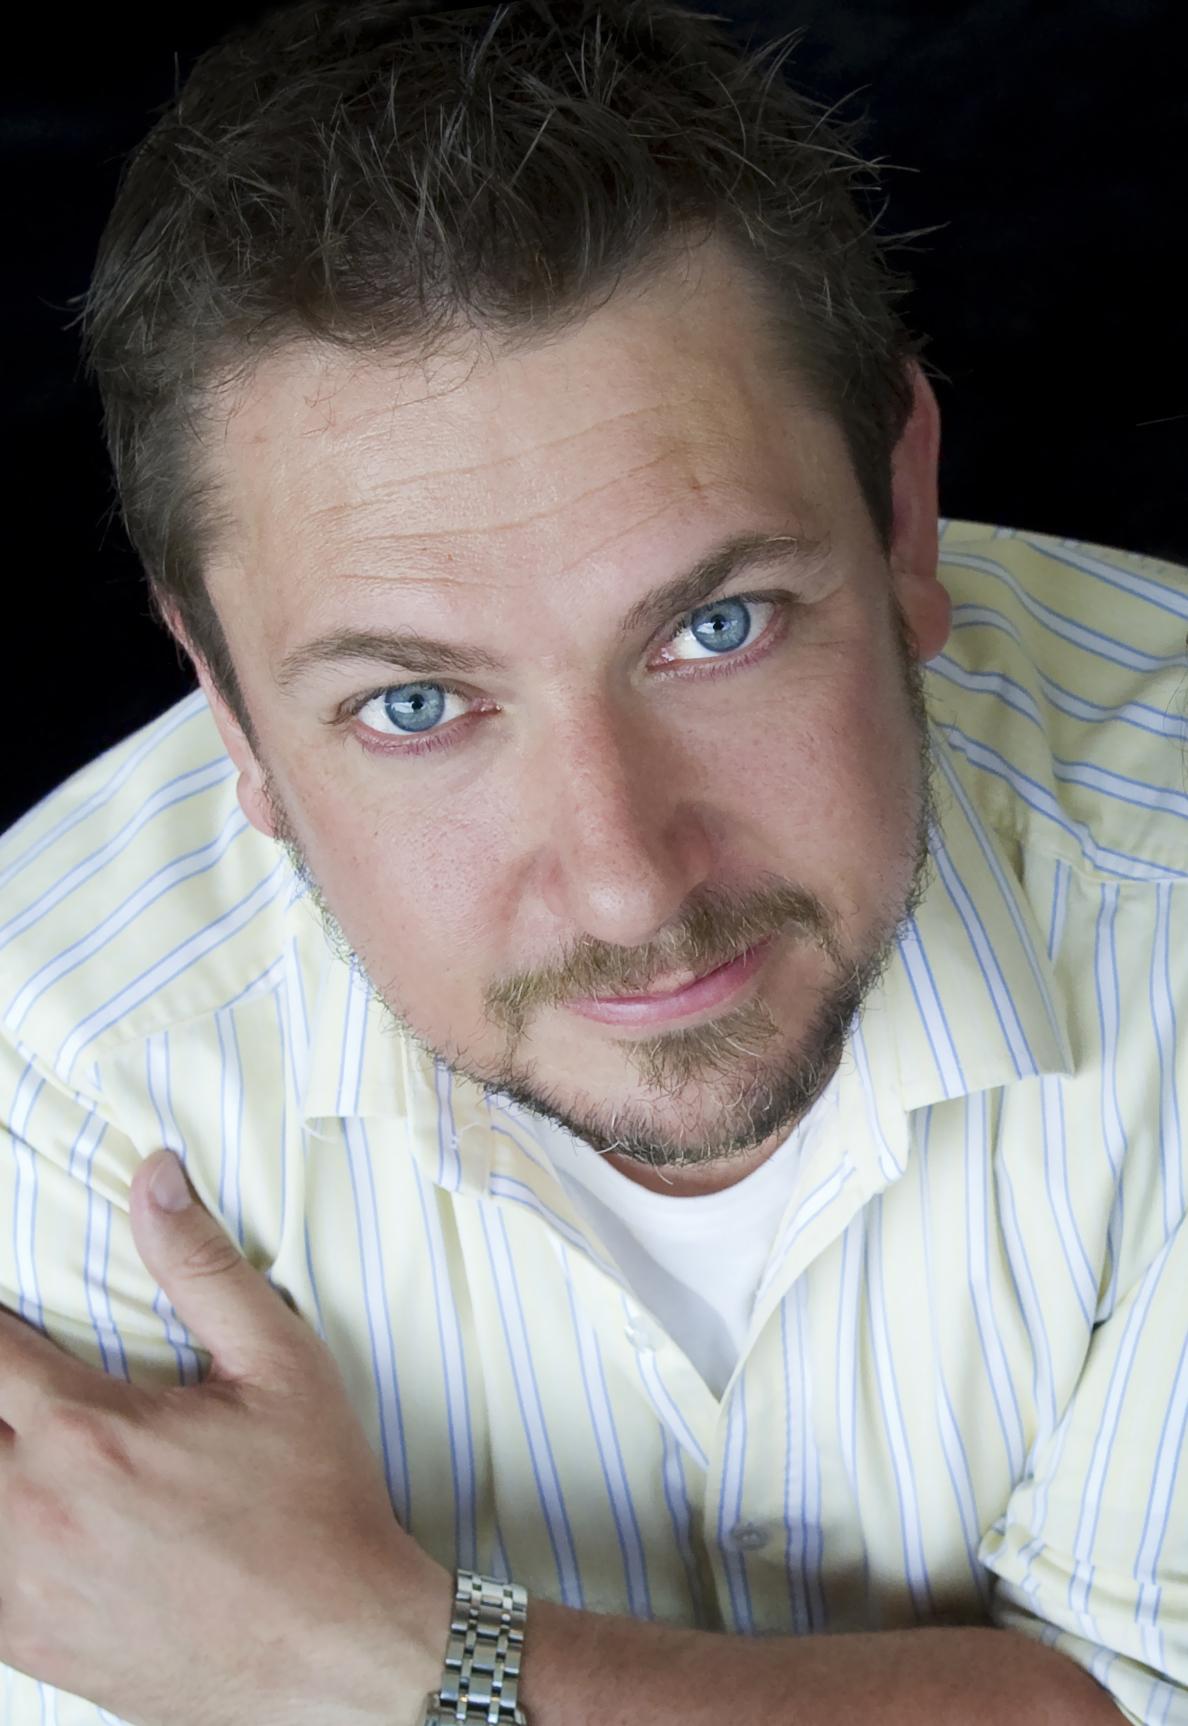 Matt Batten, Creative Director and Jo Lloyd Managing Director of Wunderman